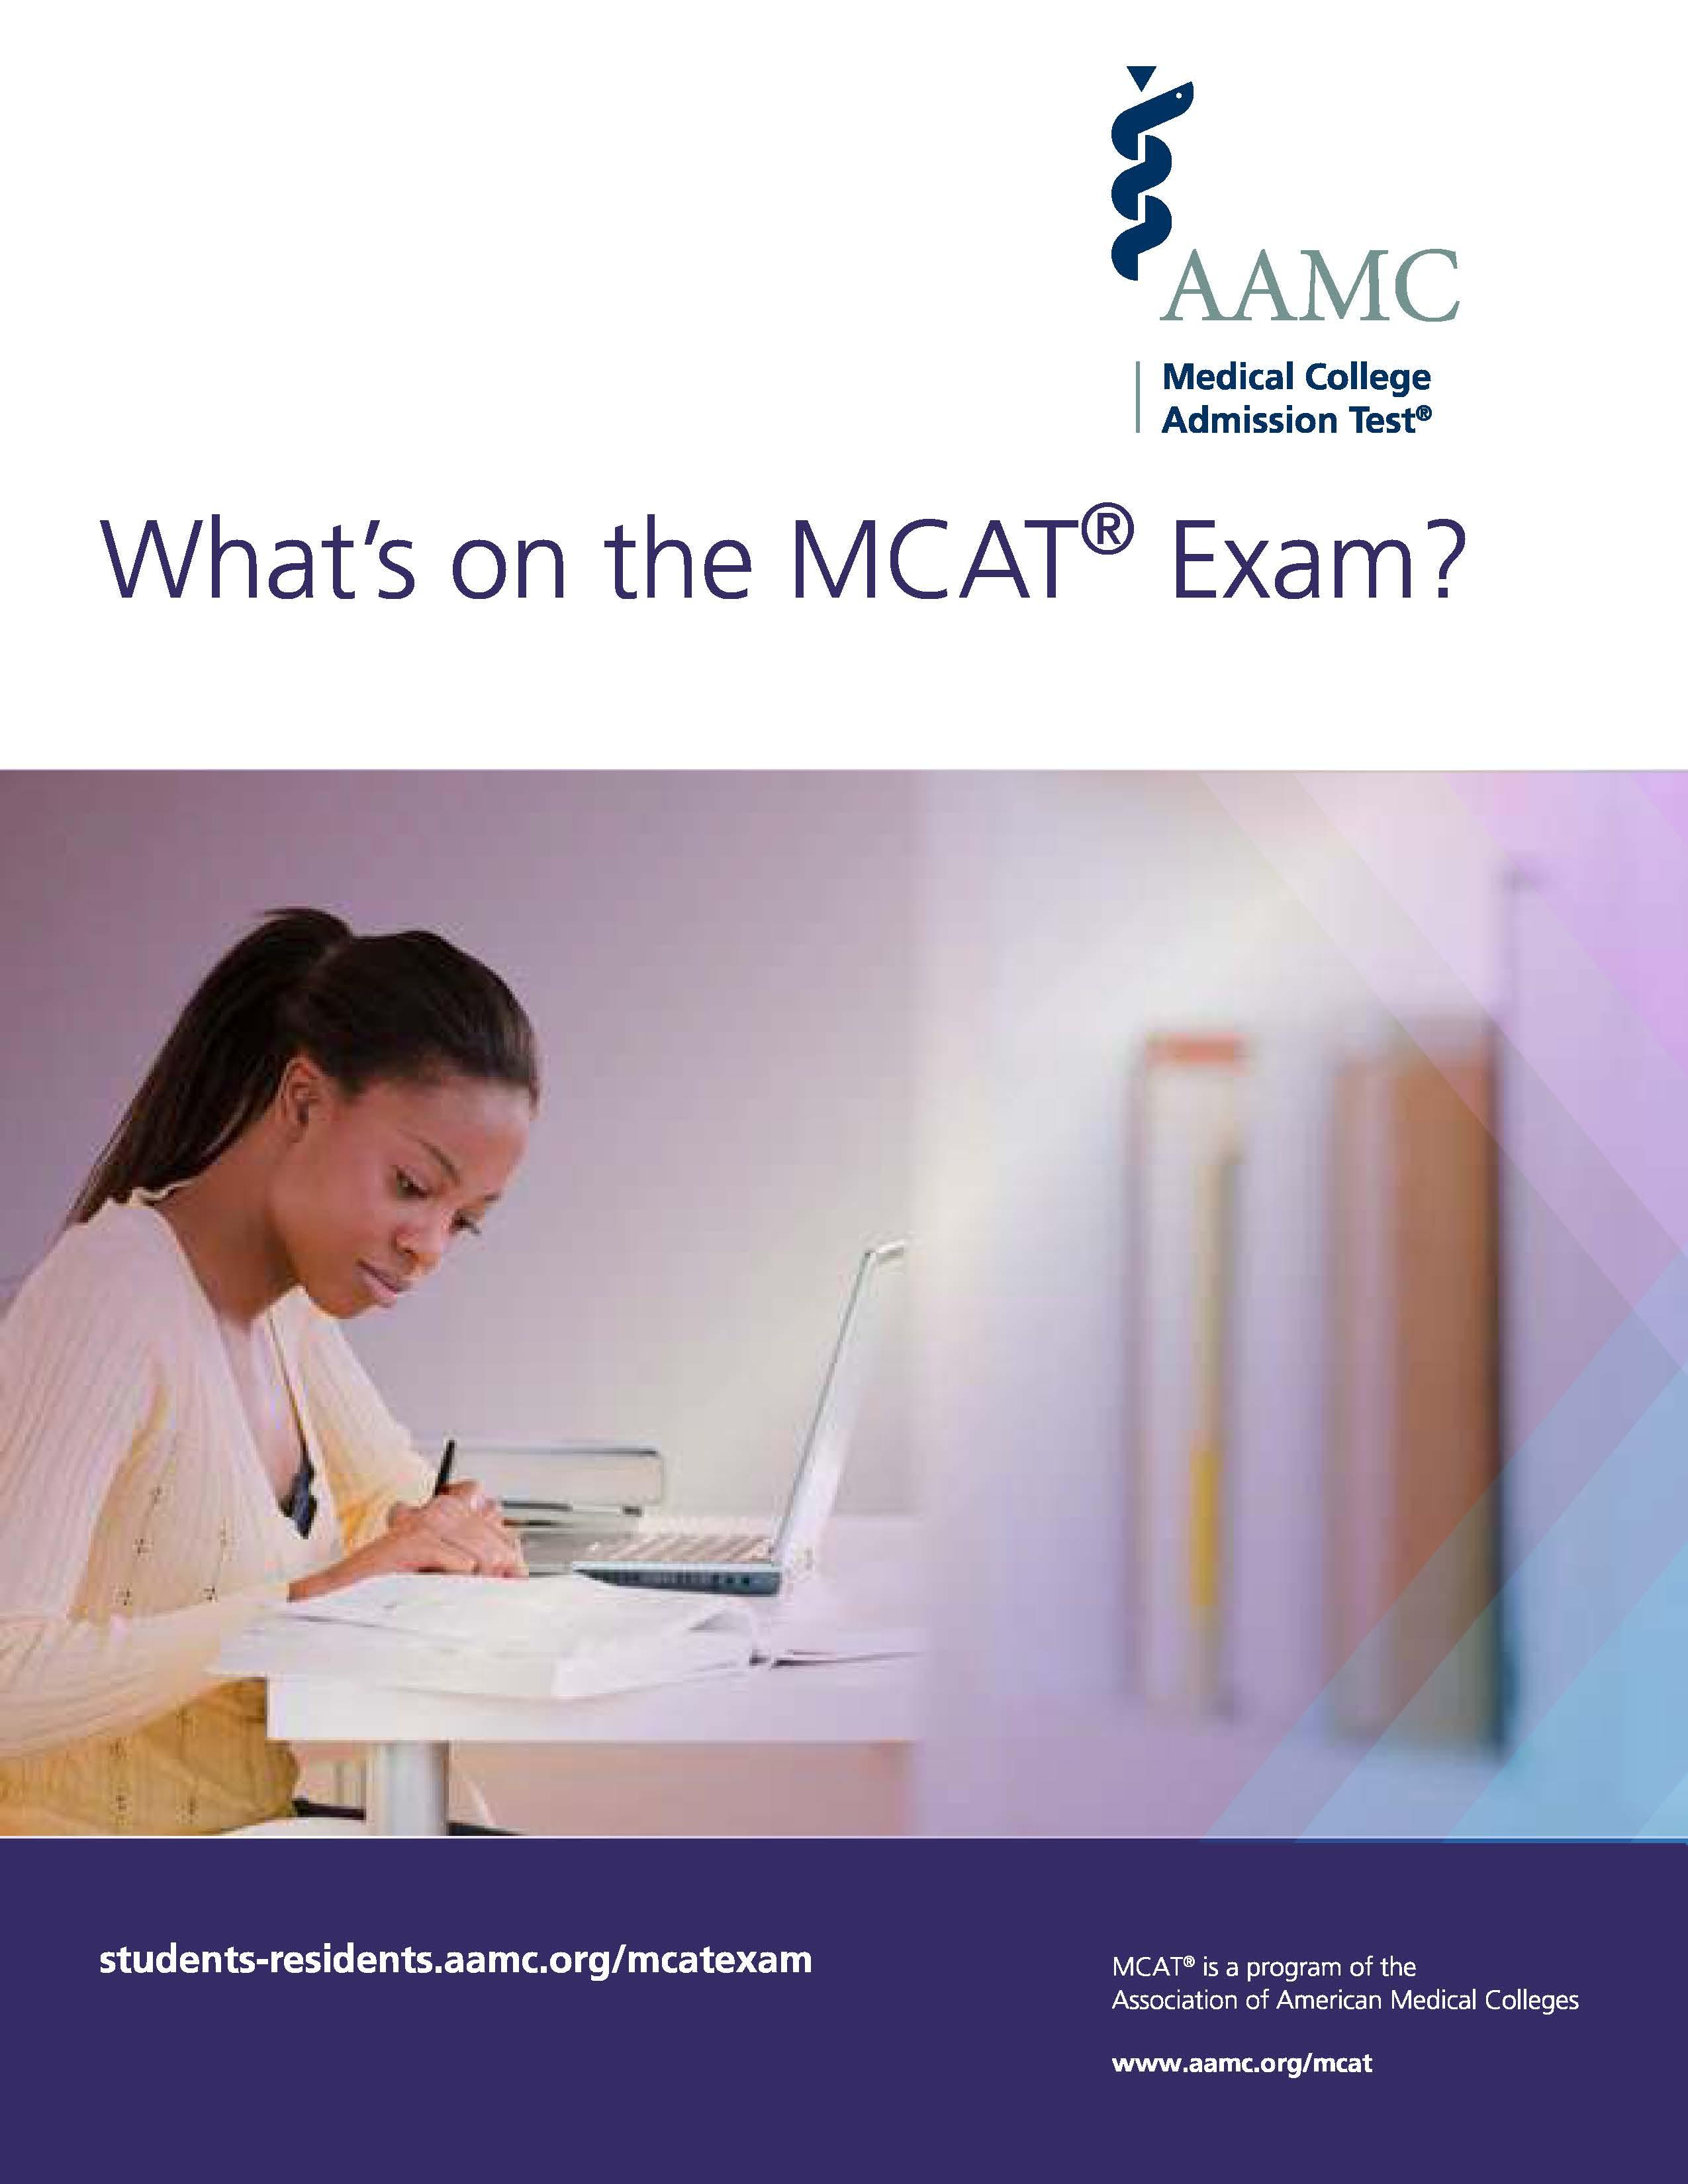 What's on the MCAT Exam?